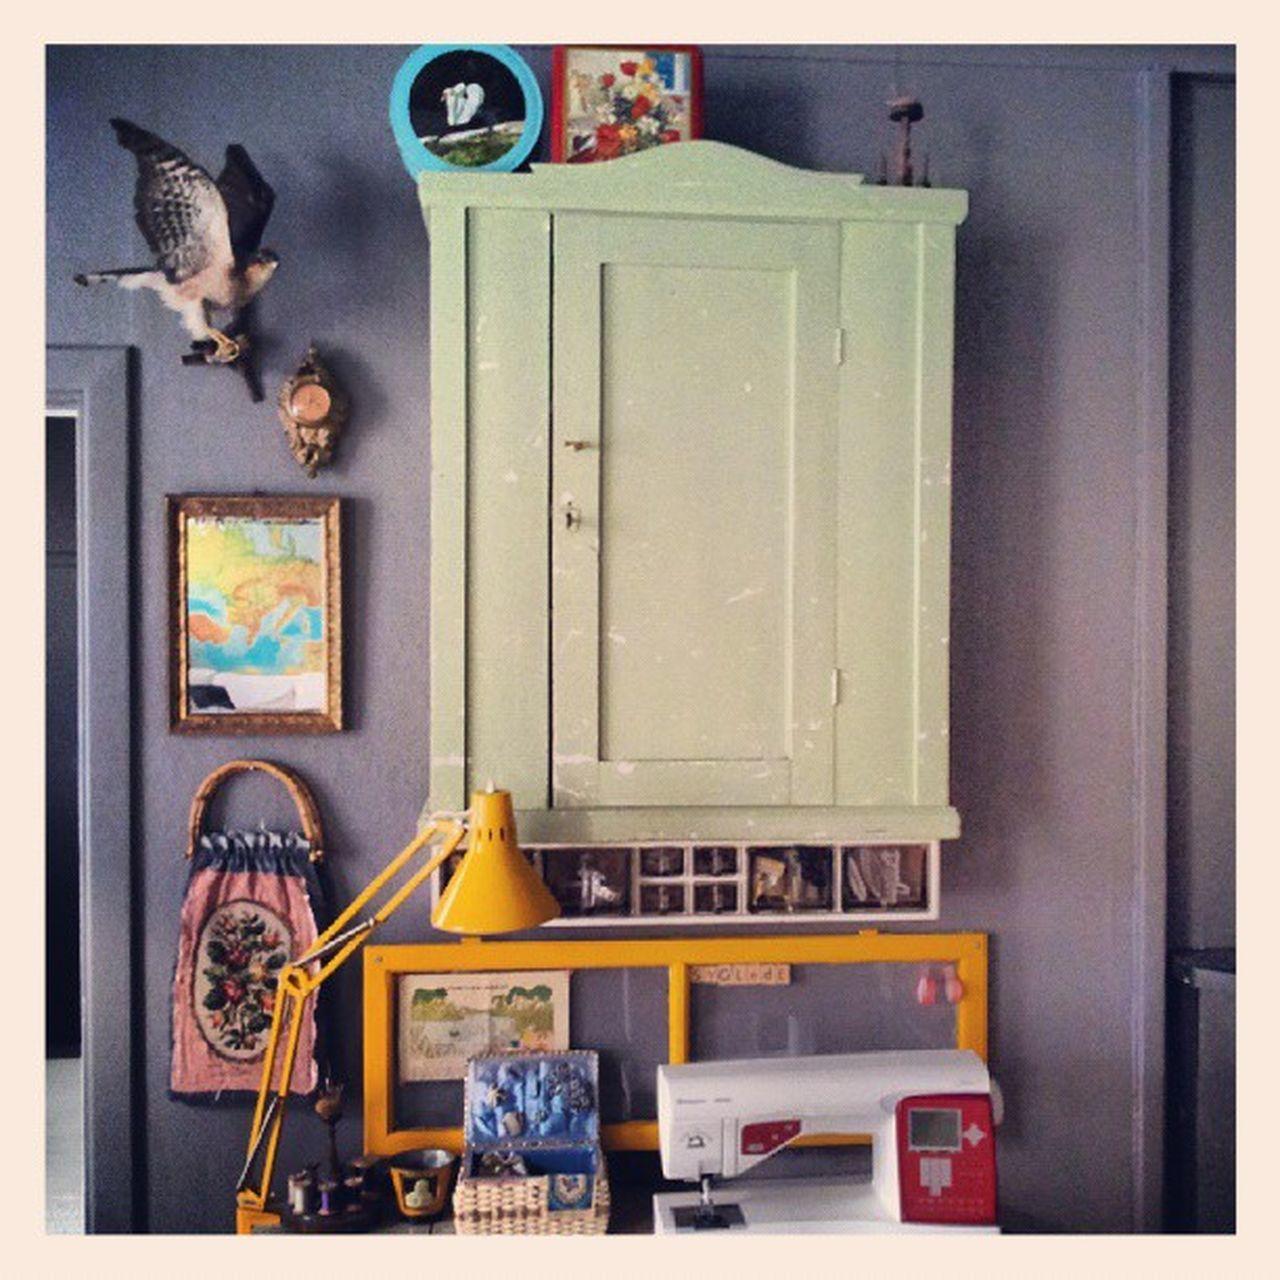 Halden Vintage NewMachine Husqvarna myhouse happy yellow